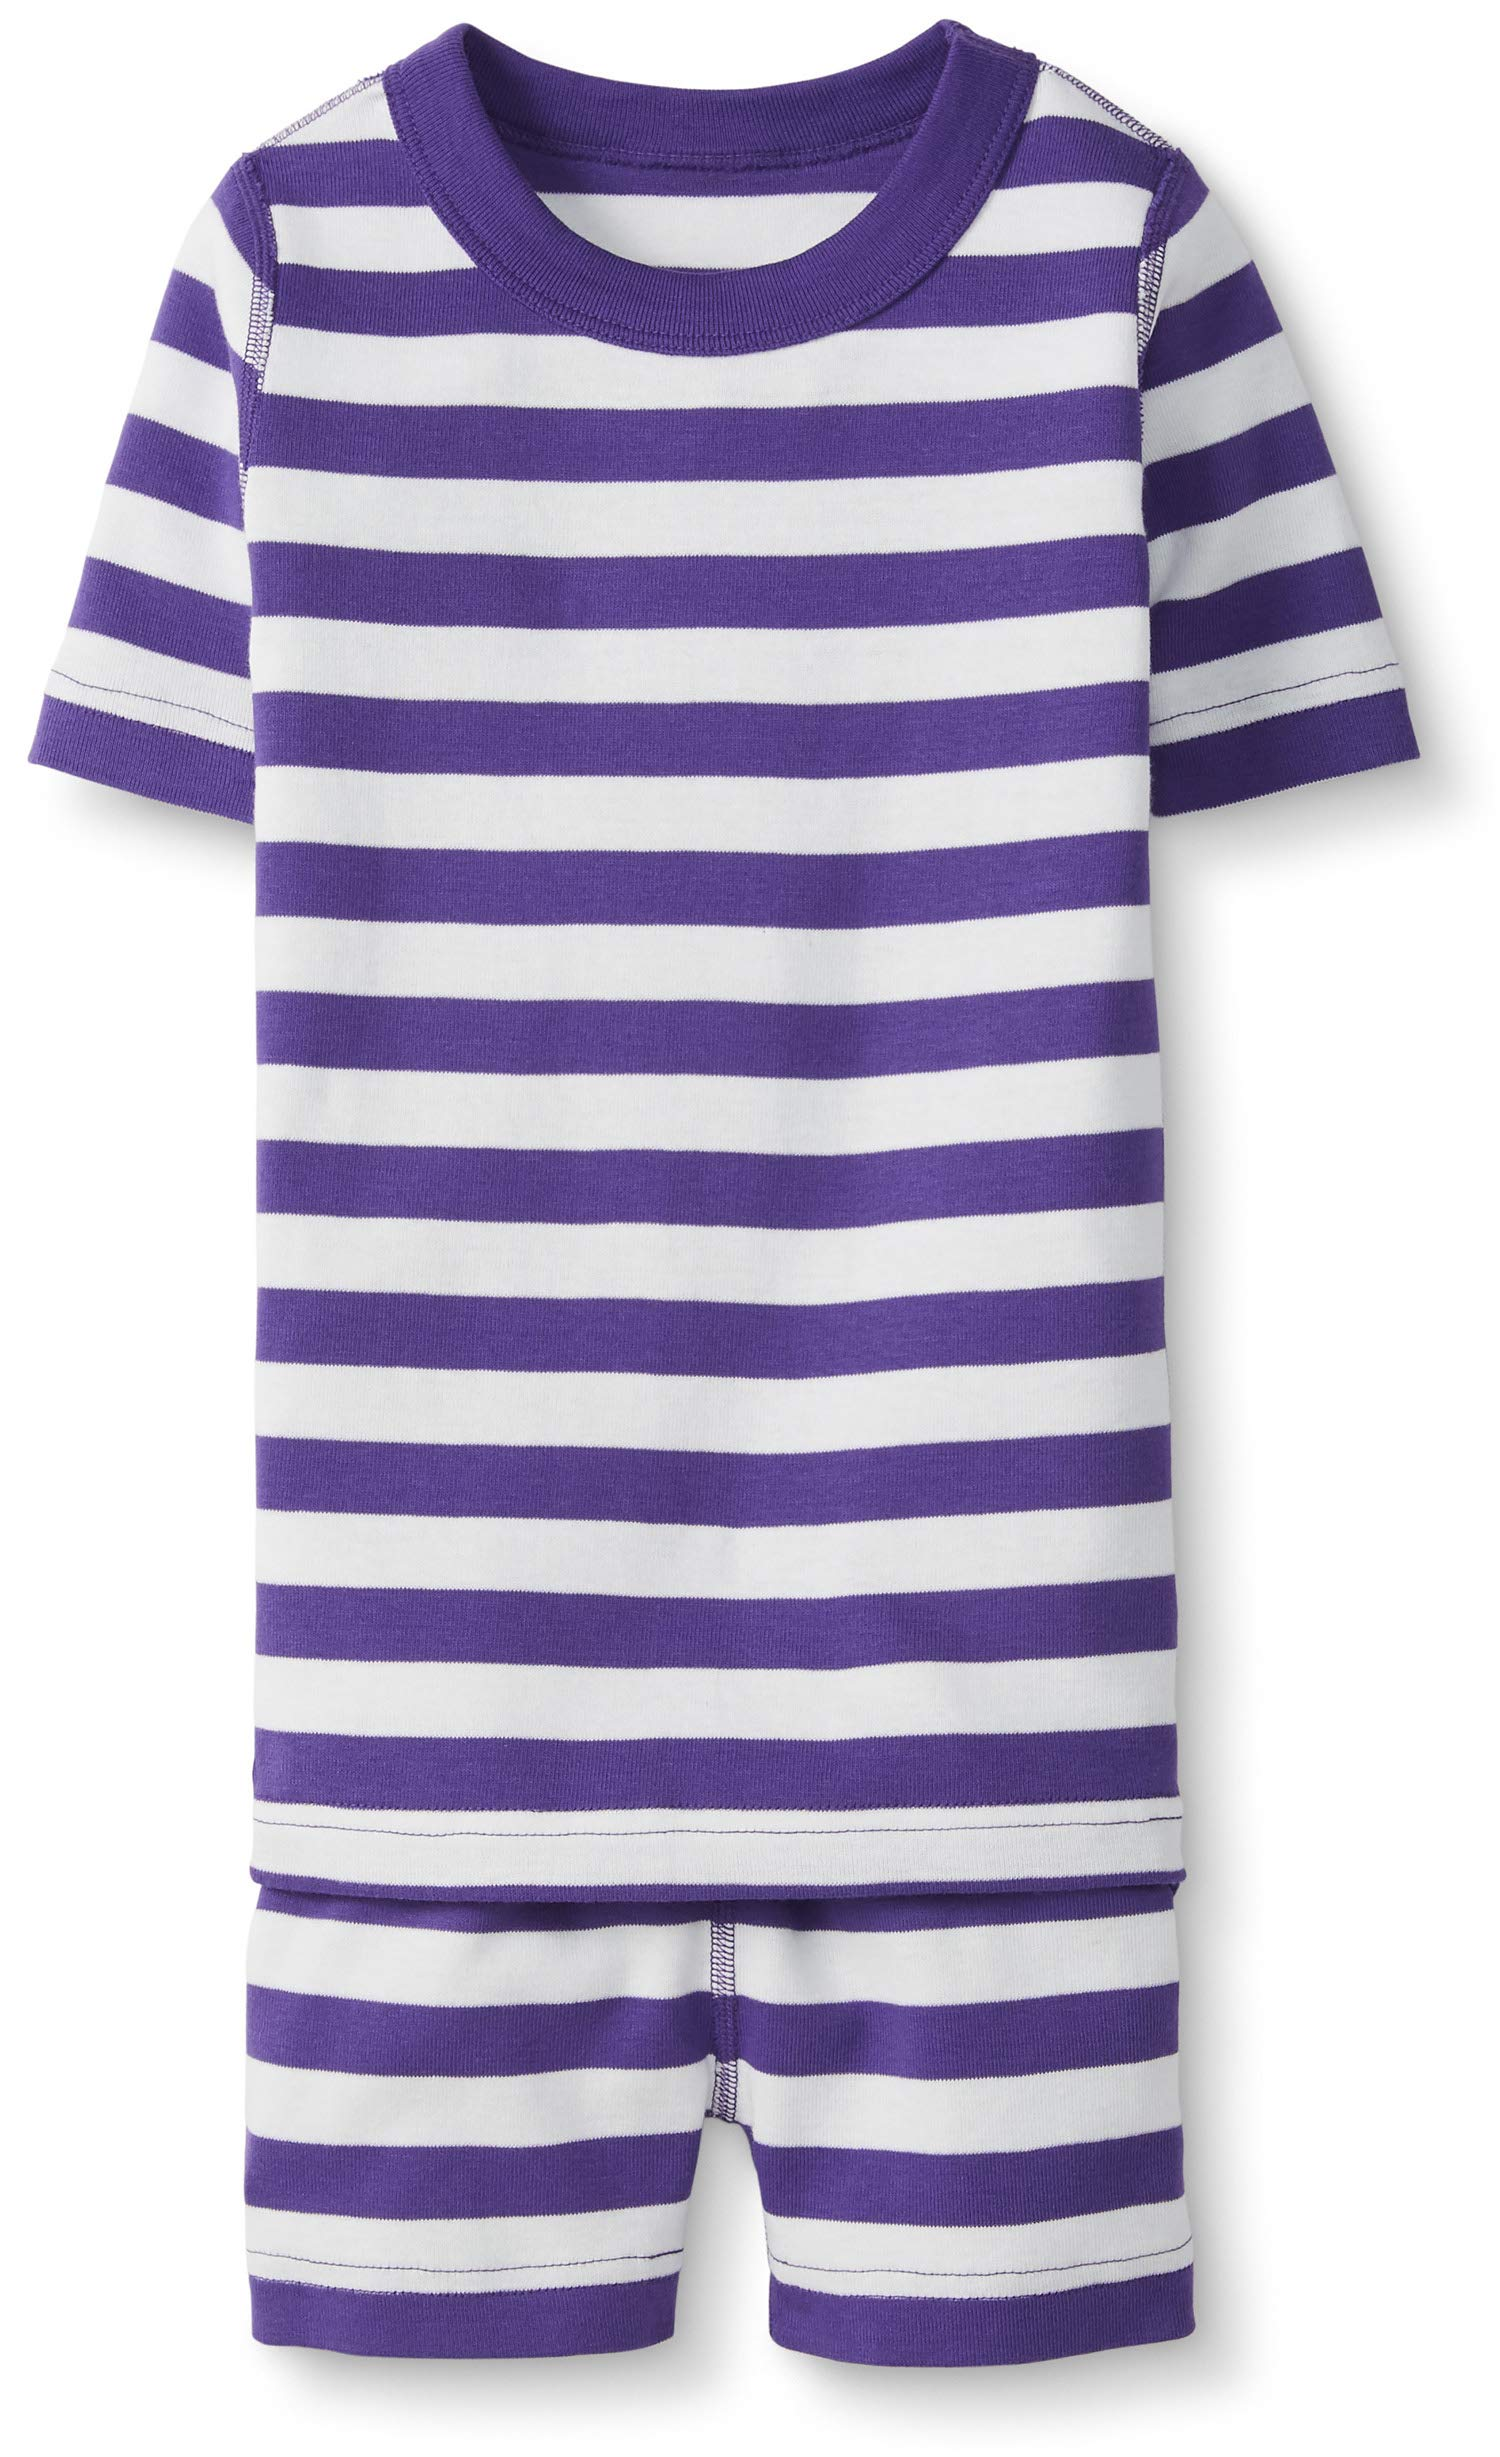 Hanna Andersson Kids Short Sleeved Pajamas in Organic Cotton, Purple Hills/Hanna White, Size 130 cm